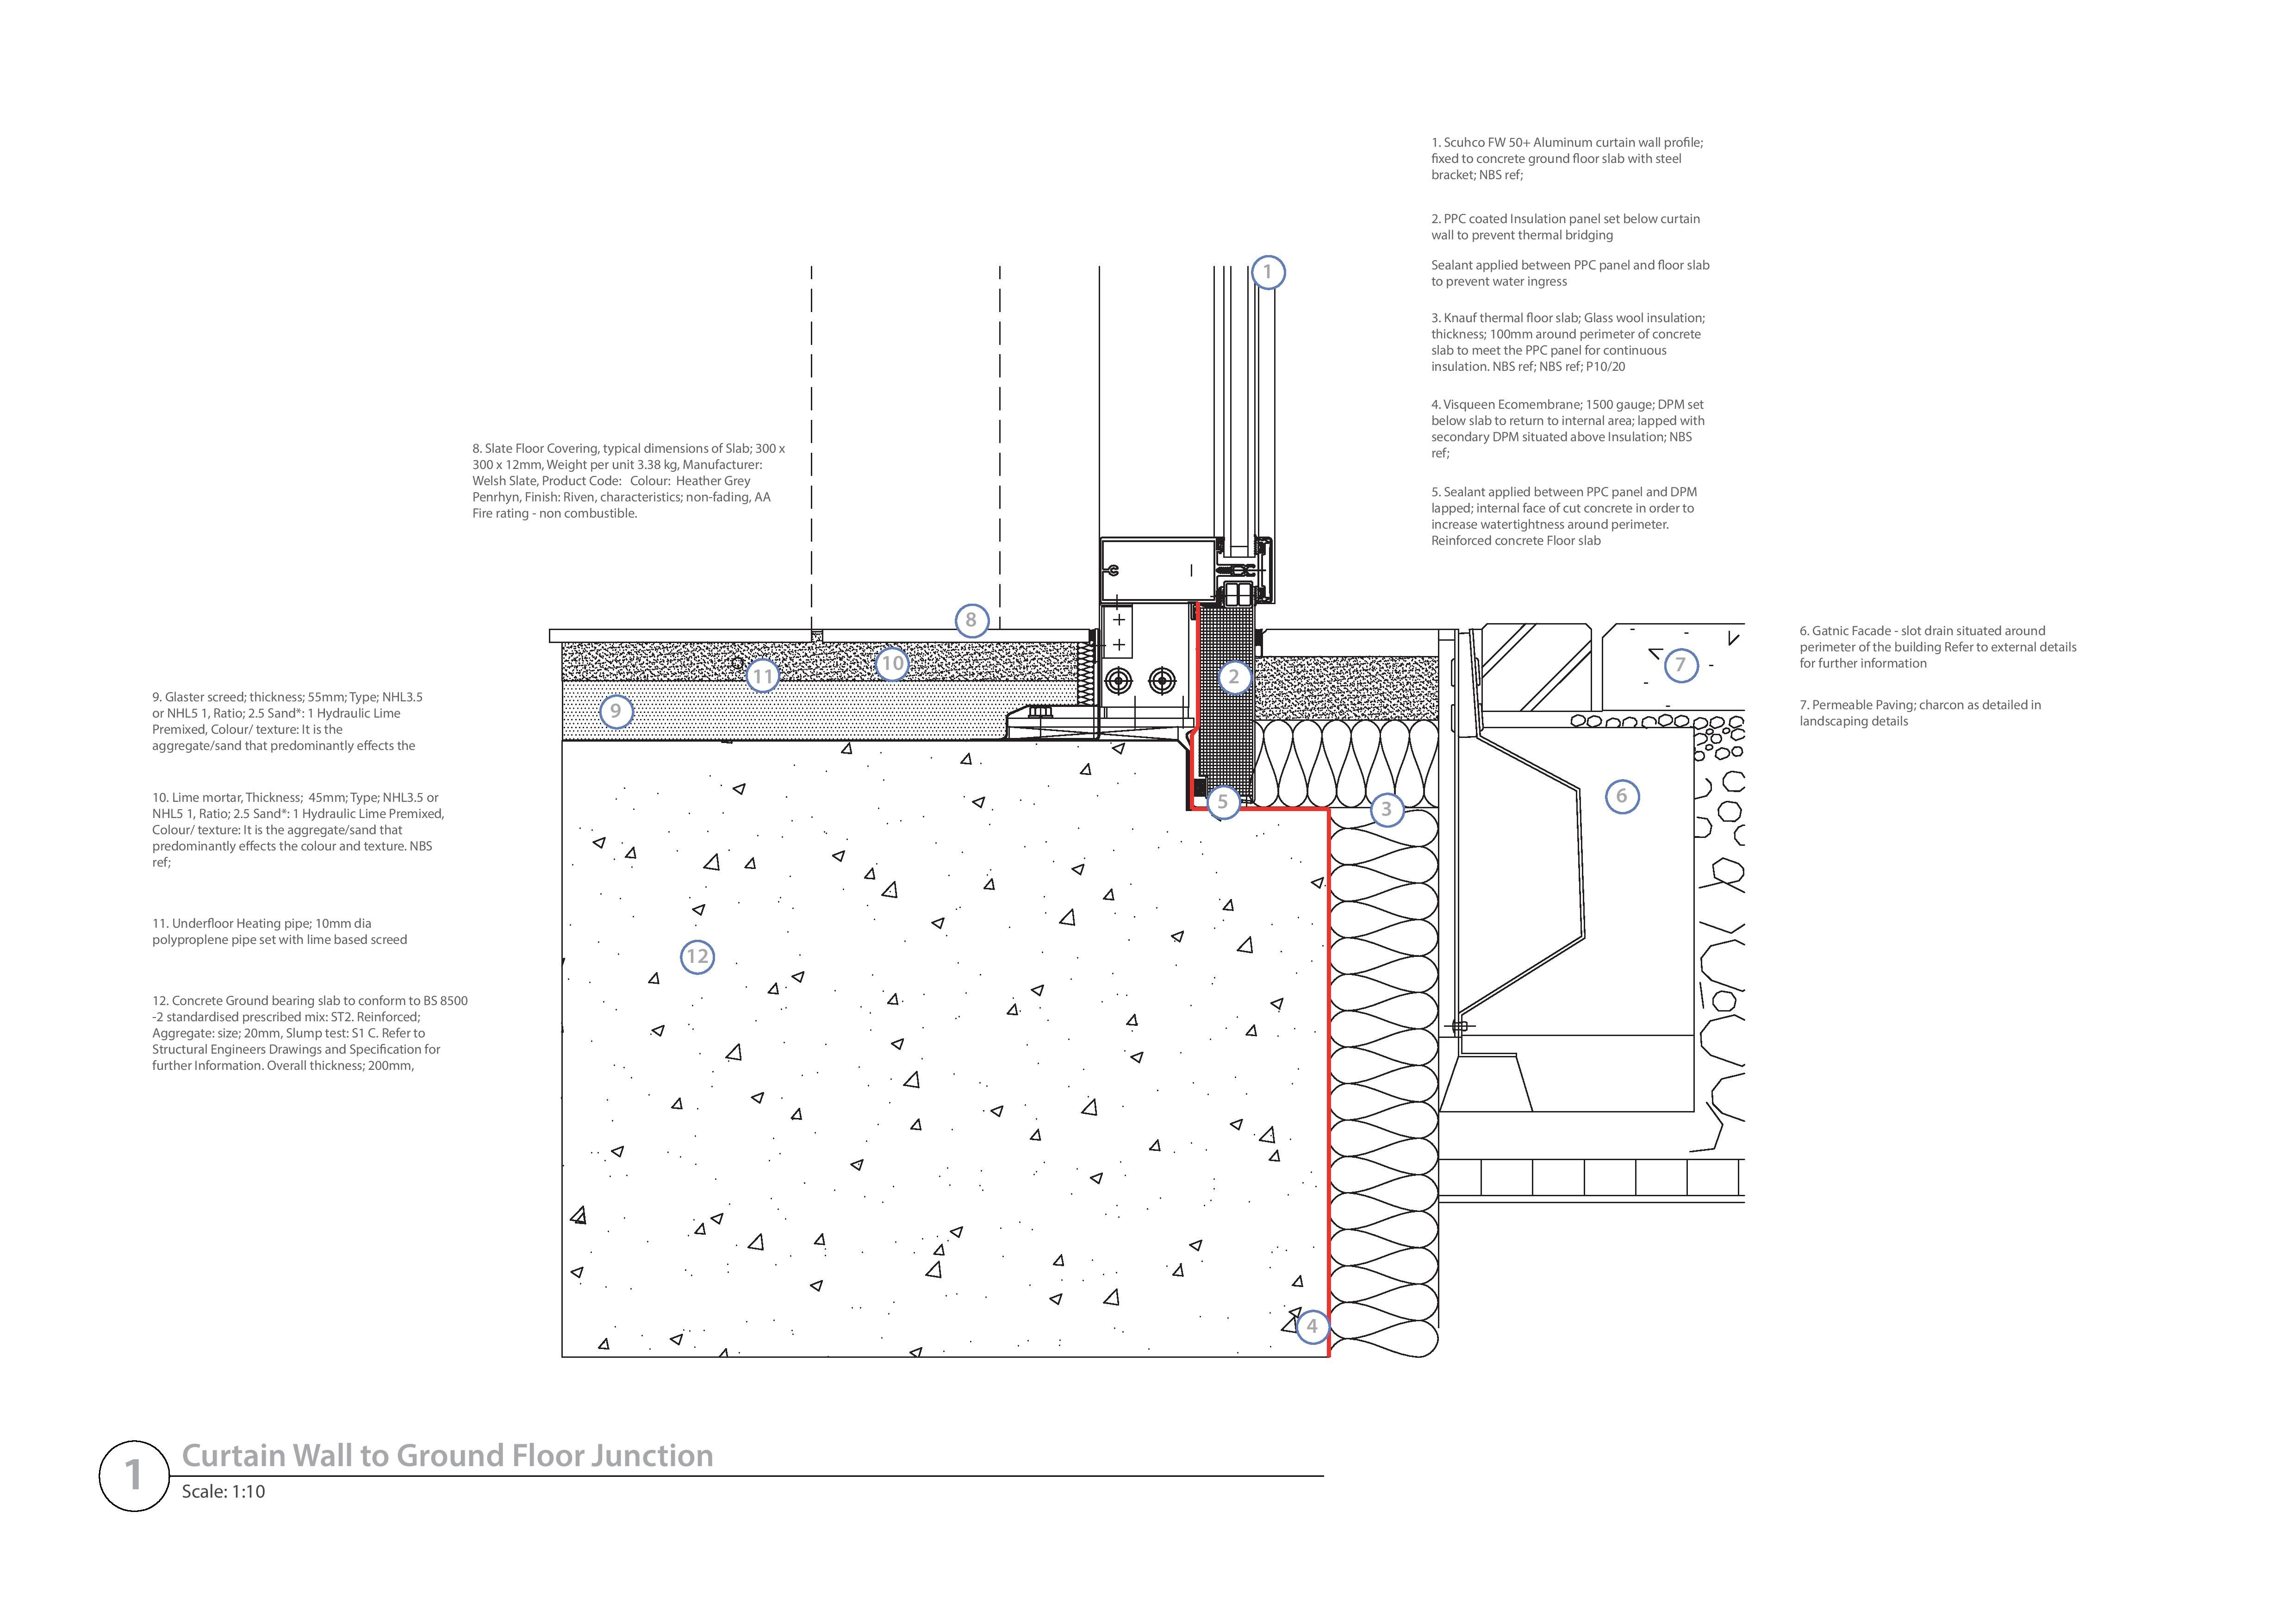 Pin By Vikas Parekh On T In 2020 Curtain Wall Detail Curtain Wall Glass Facades